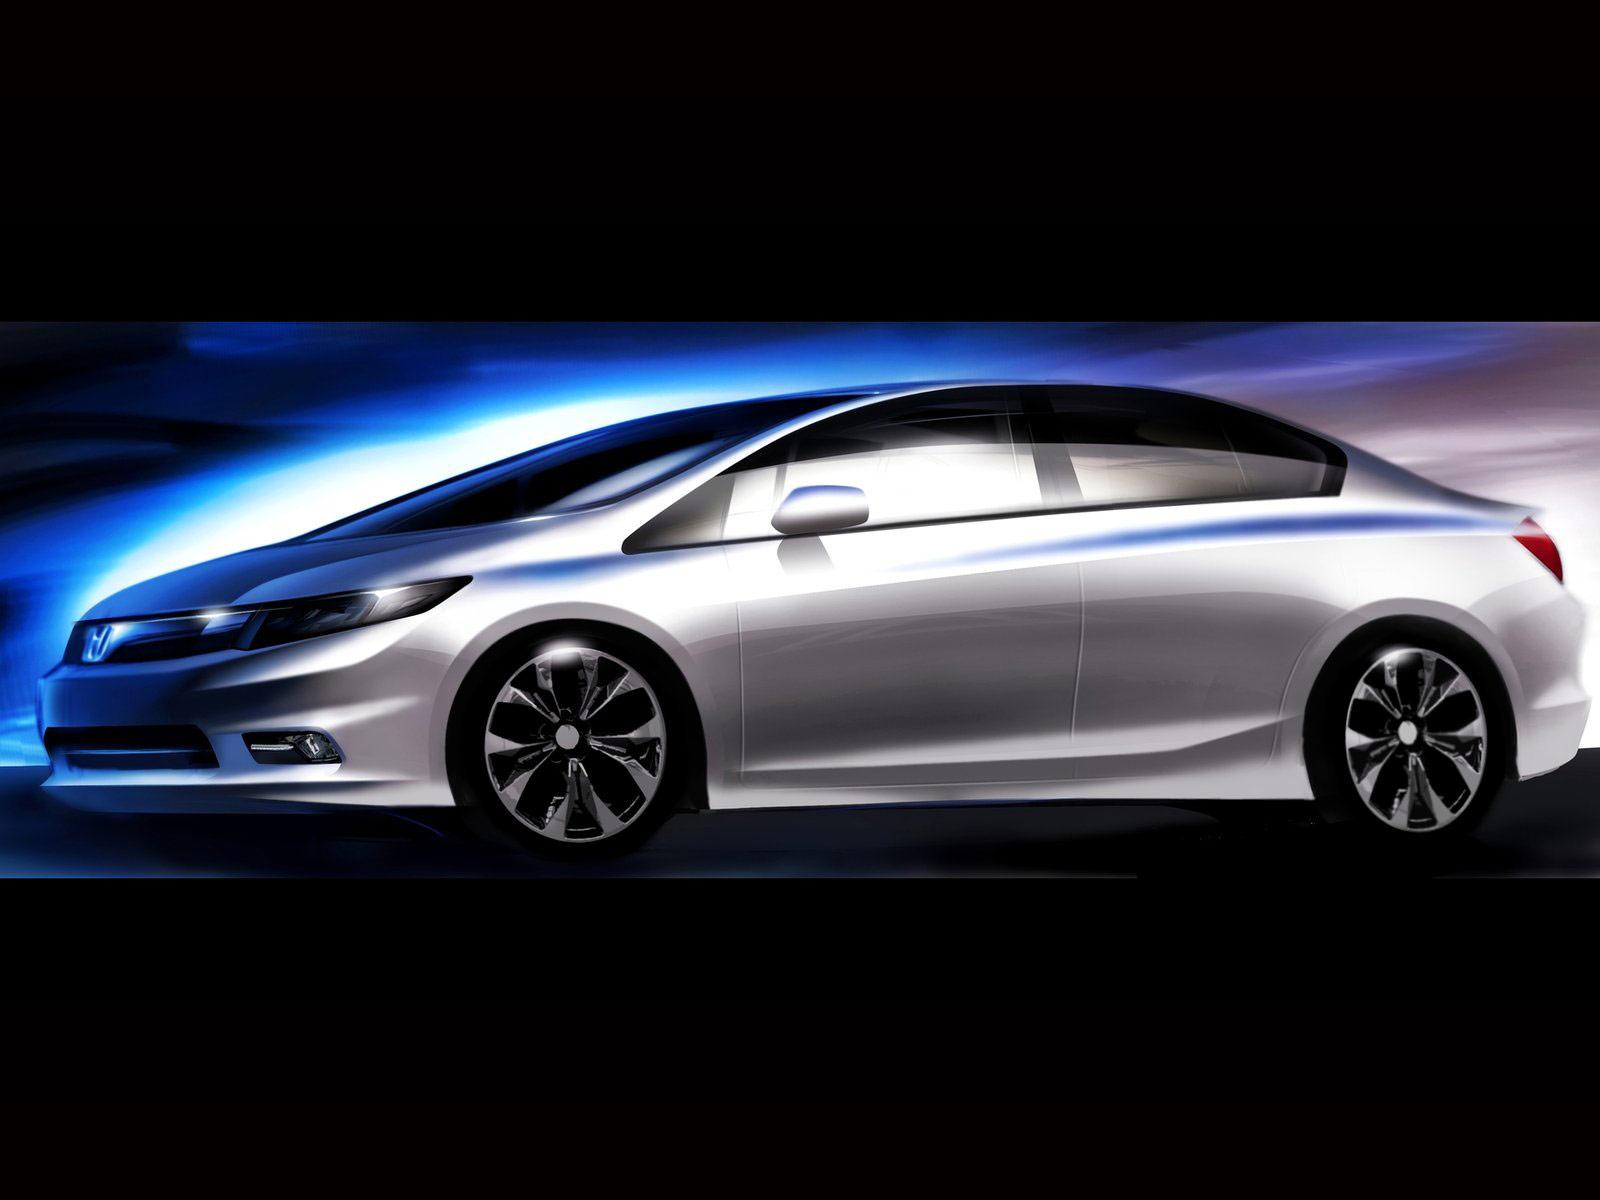 2011 Honda Civic Concept Car Photos Accident Lawyers Info